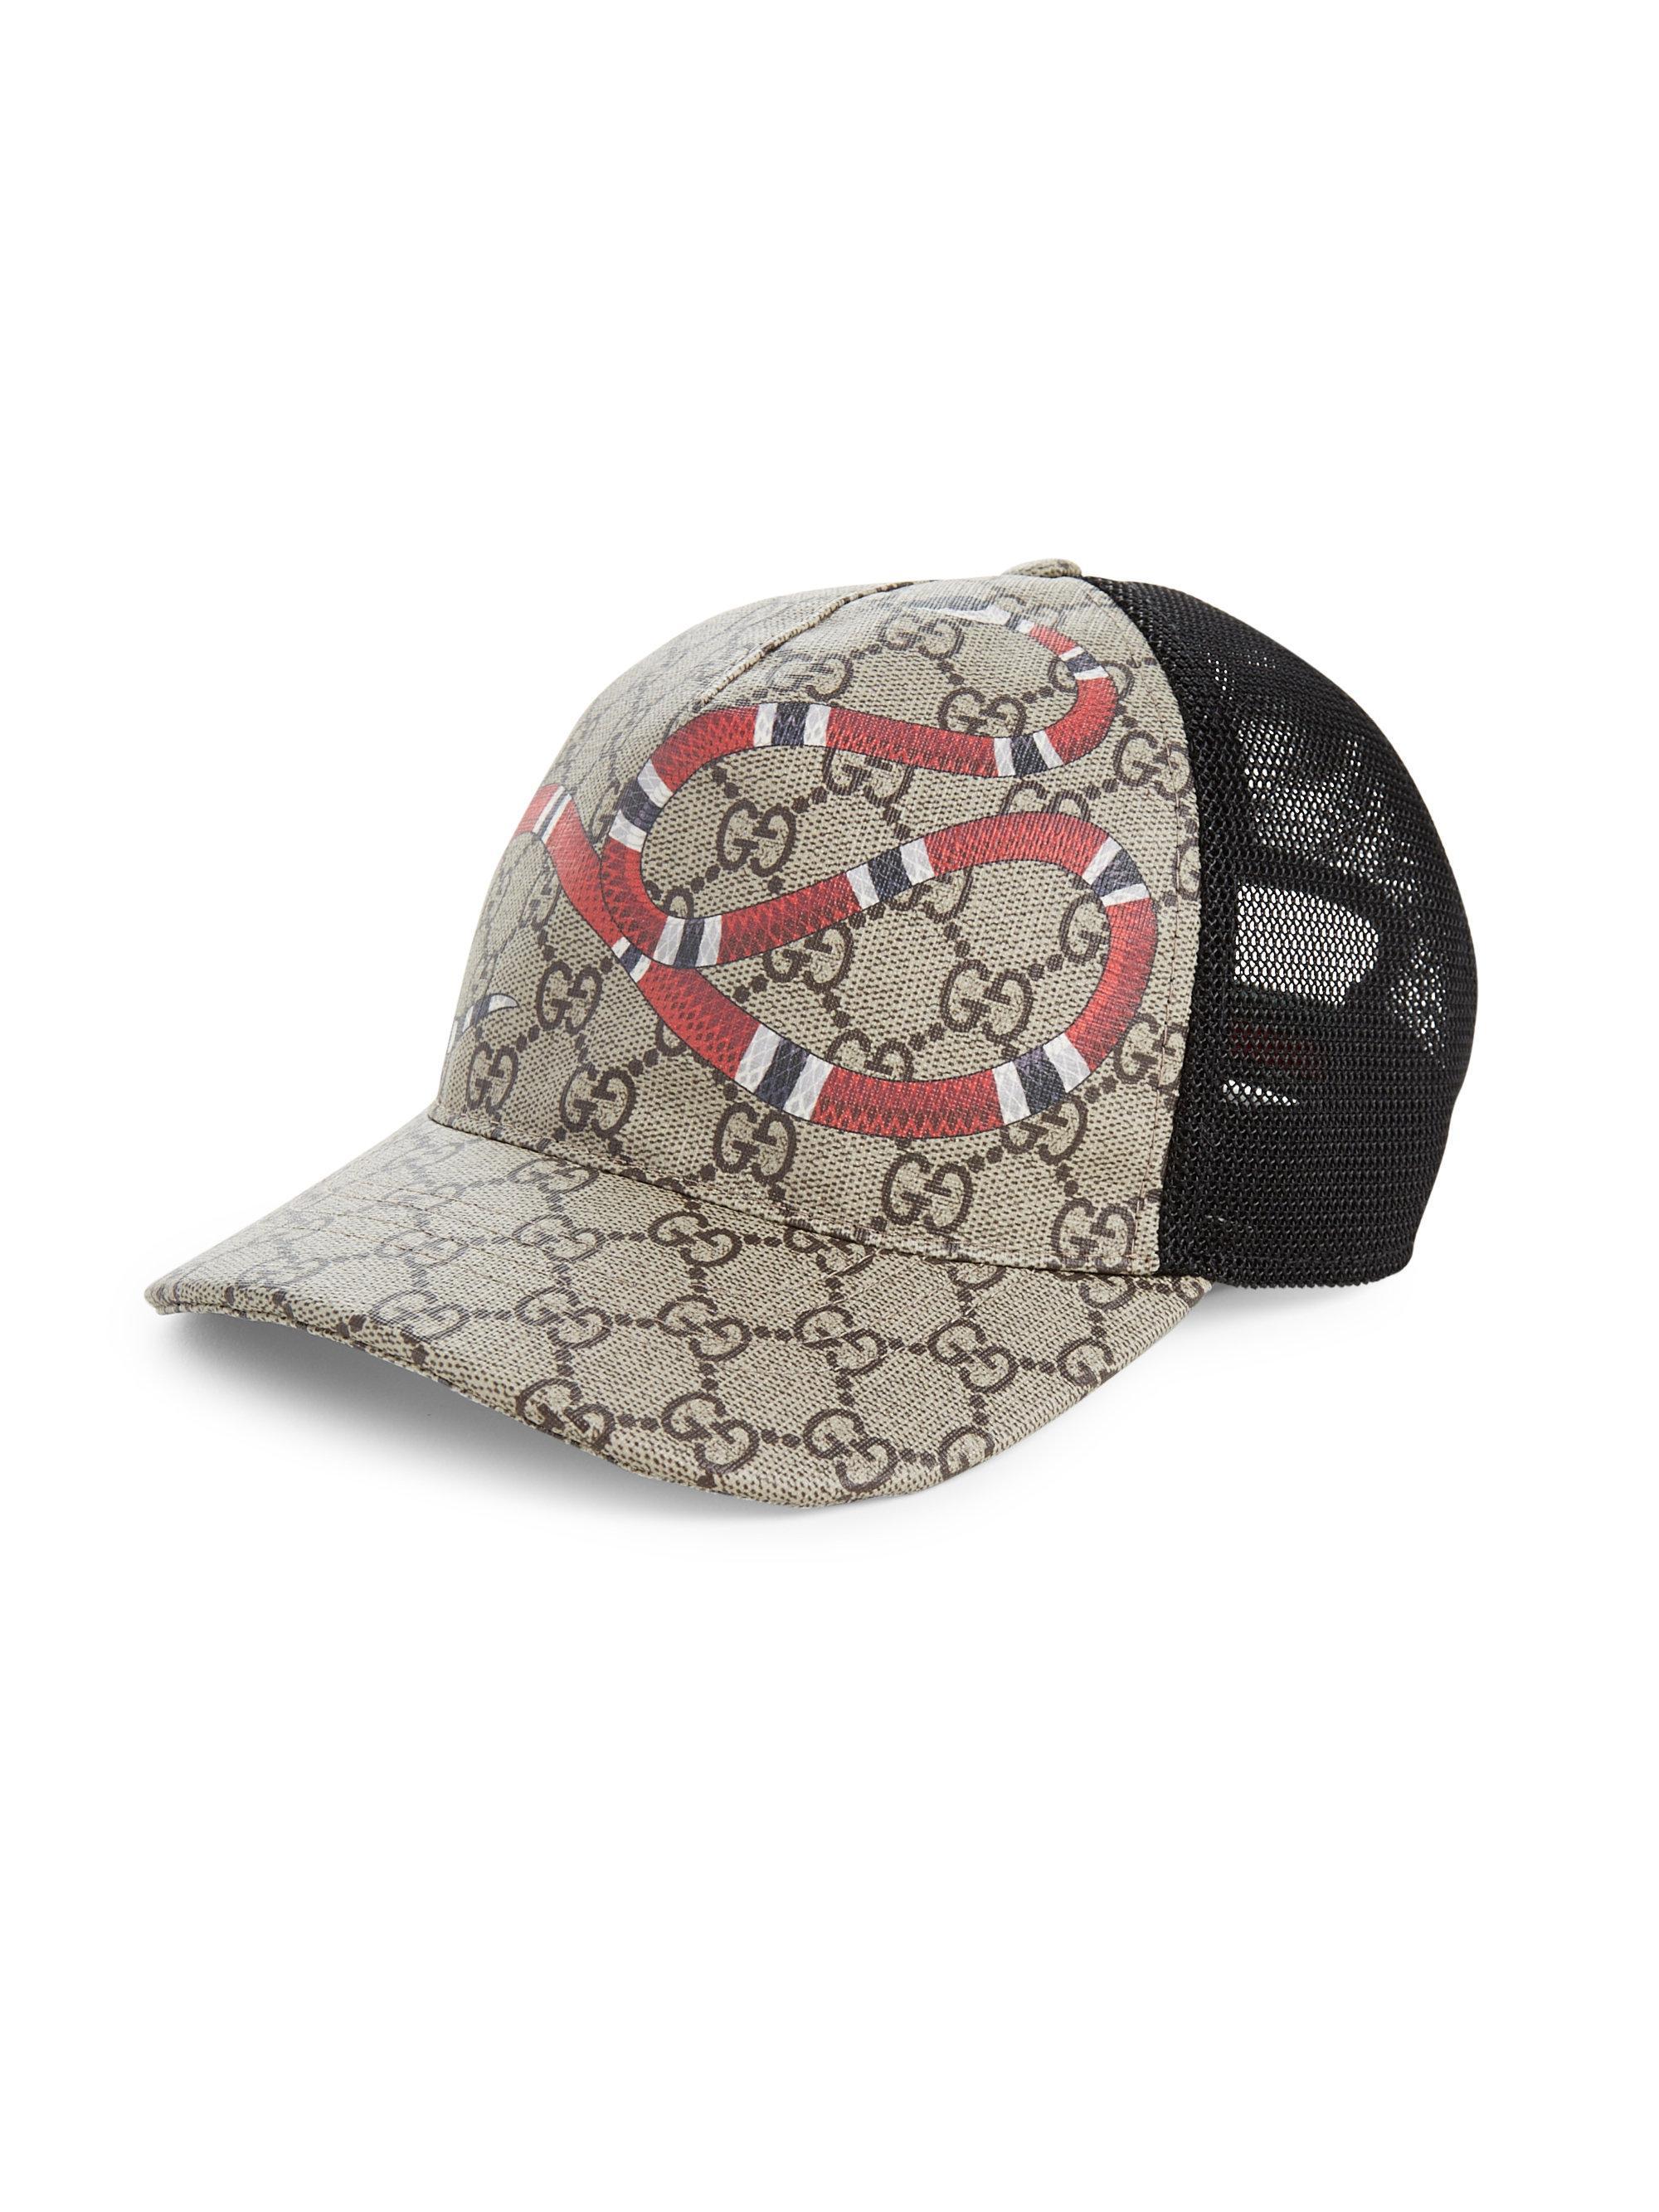 42cf8db3f30 Mens Logo Mesh Baseball Cap Gucci rsDlcKaYD - baikal-volga.com